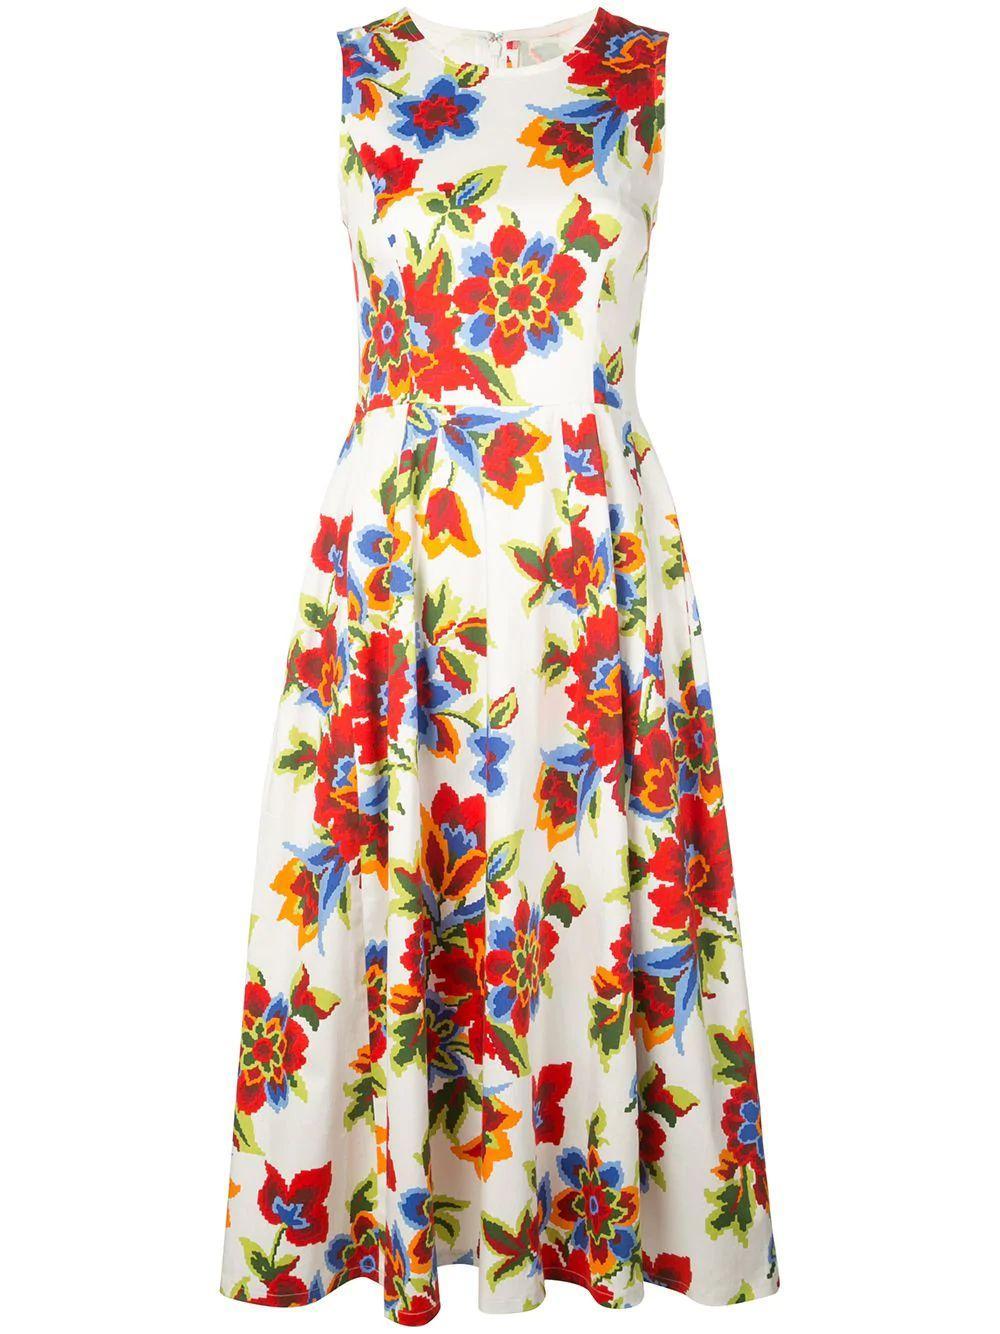 Sleeve Less Pixel Floral Print A Line Dress Item # R2011N501PCS